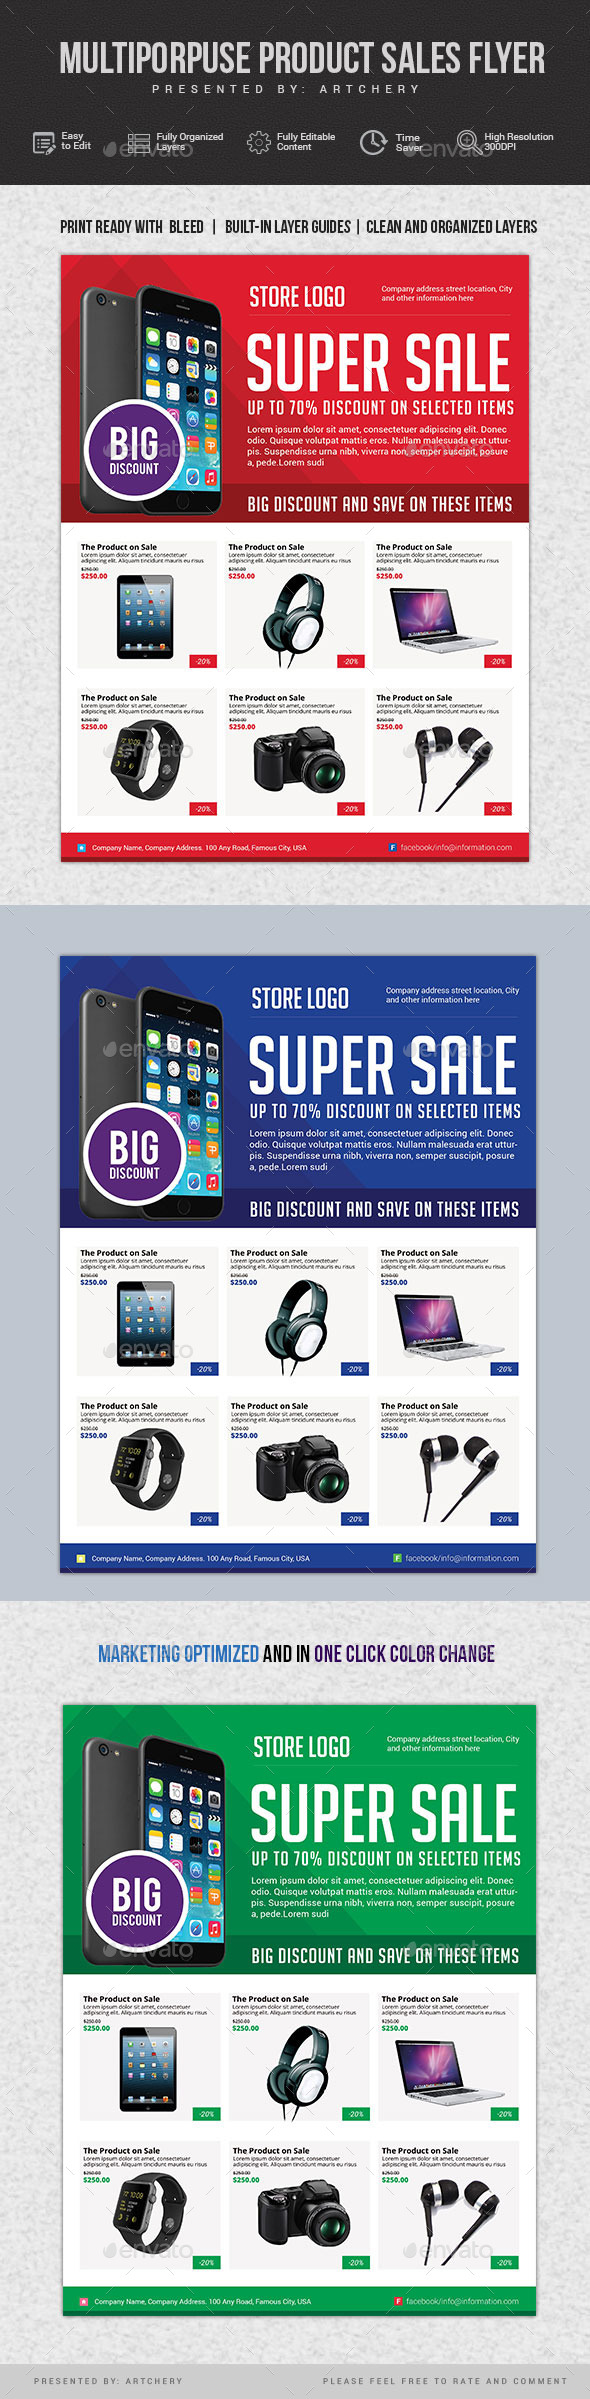 multiporpuse product sales flyer pinterest sale flyer brochures